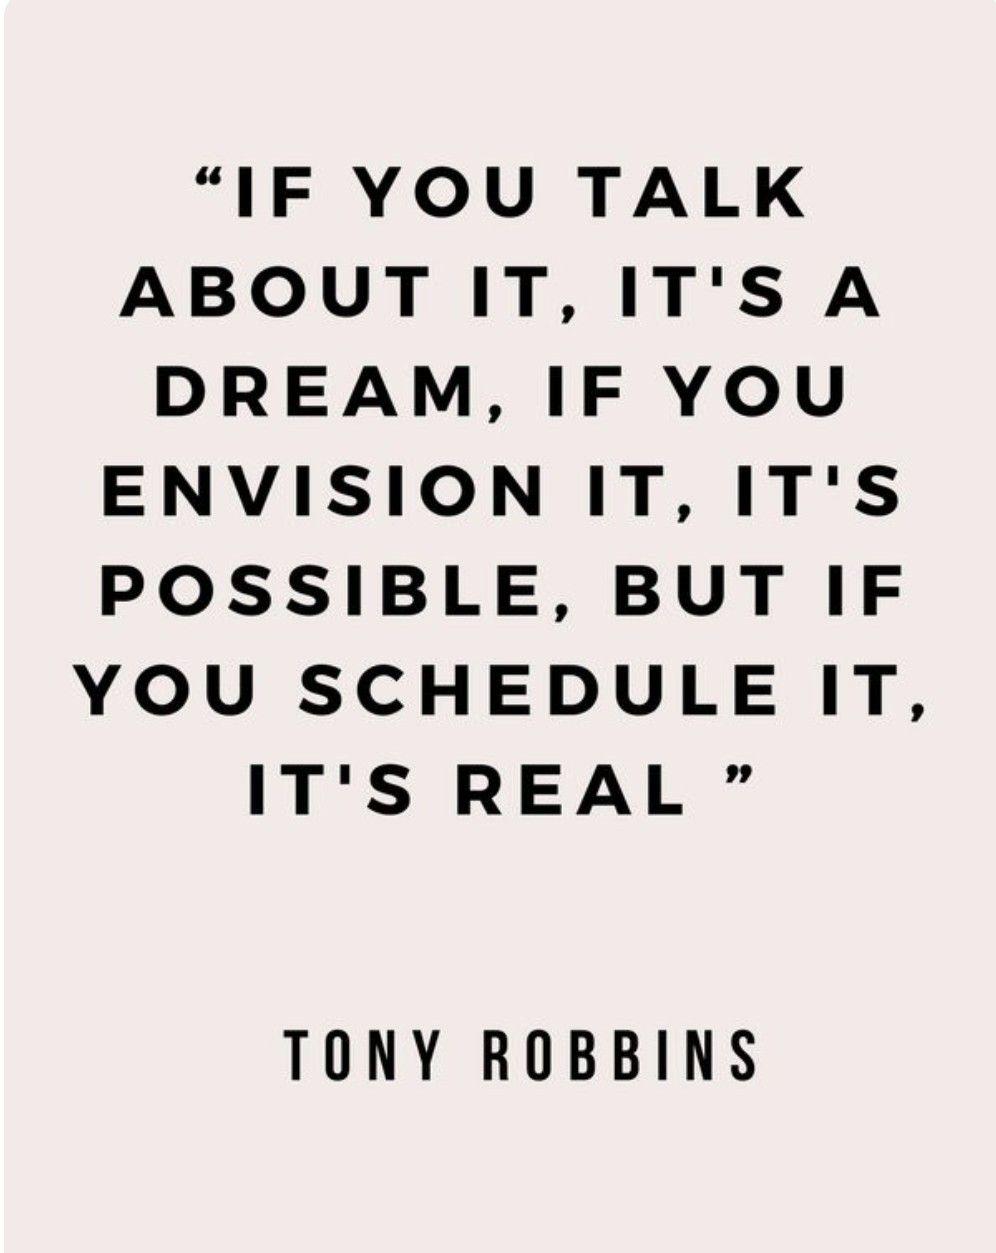 nlp citater Tony Robbins Quotes | Tony Robbins | NLP | NLP Quotes #mindset  nlp citater